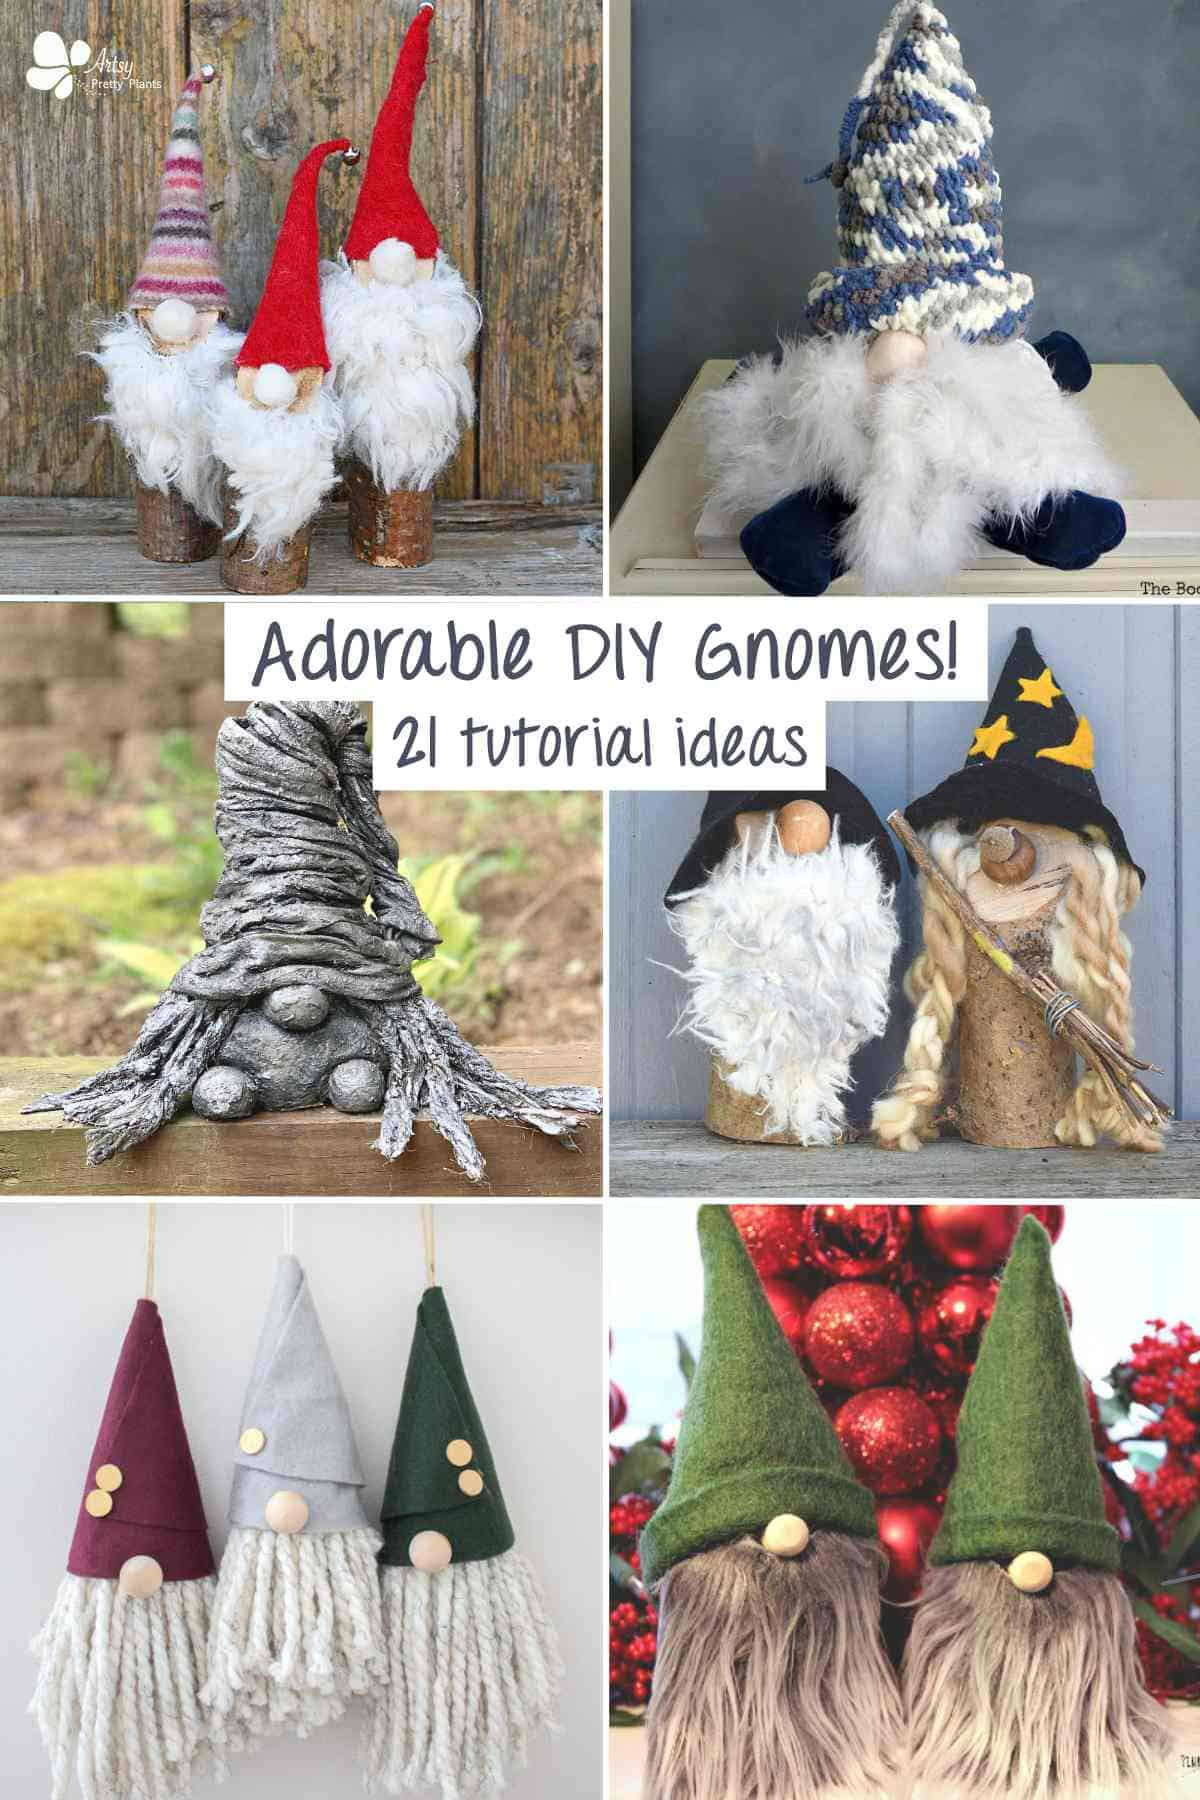 DIY Gnomes-DIY Gnomes-6 sets of different handmade gnomes.